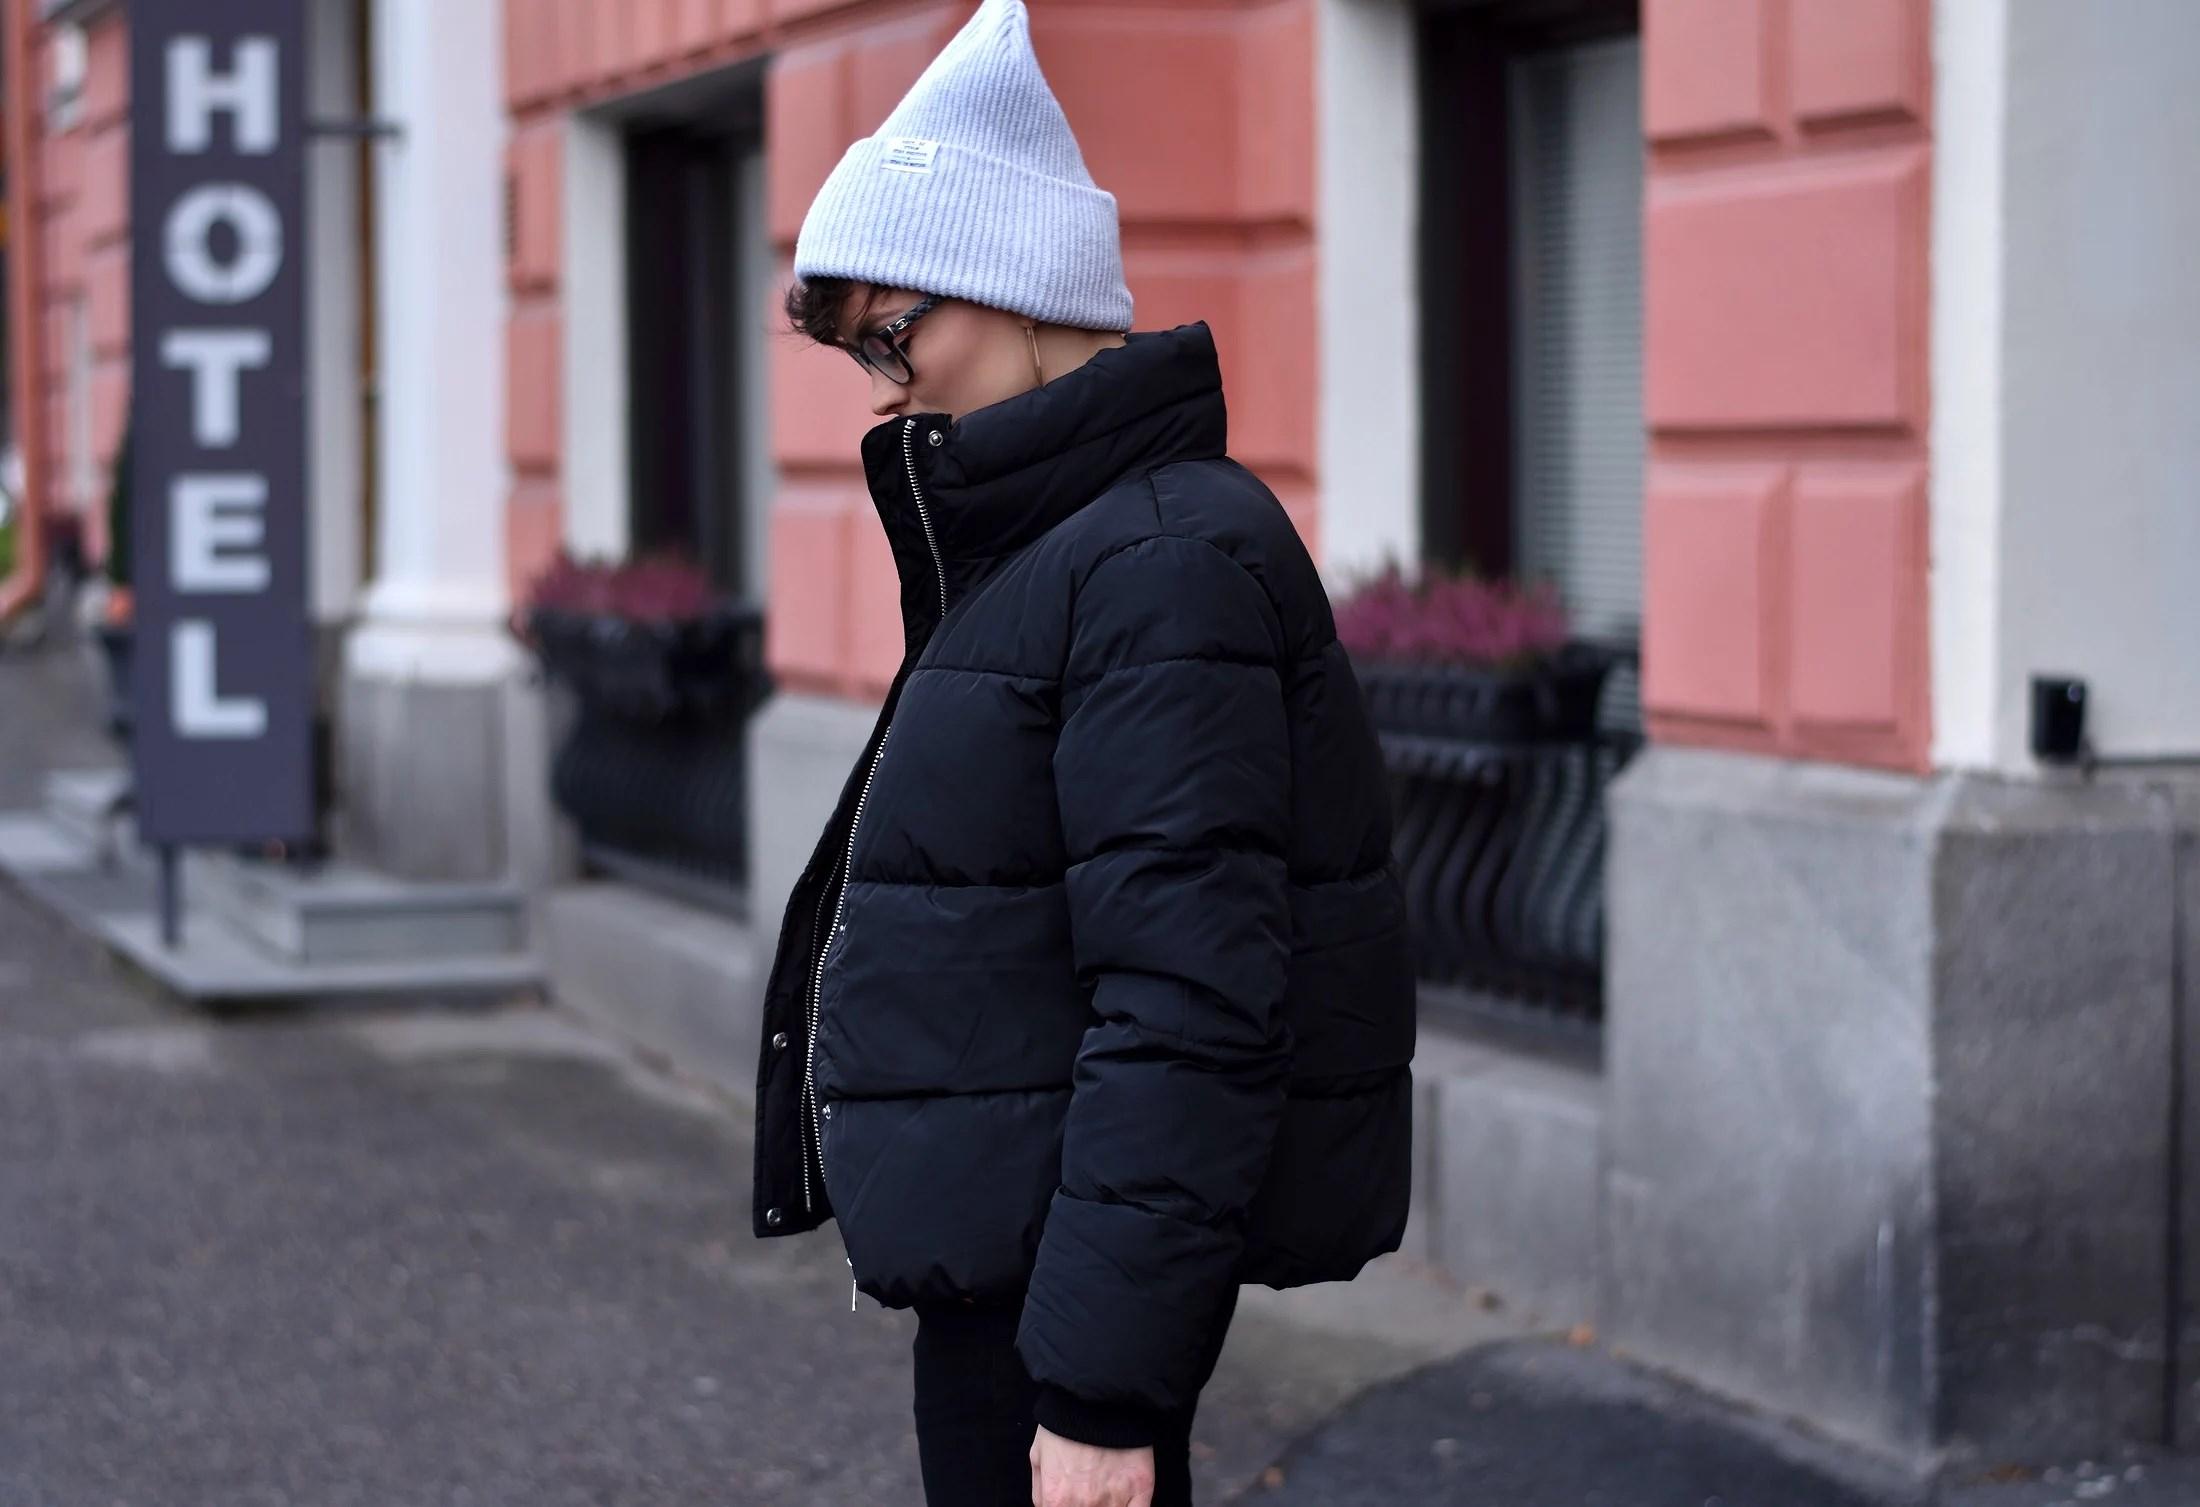 A colder season